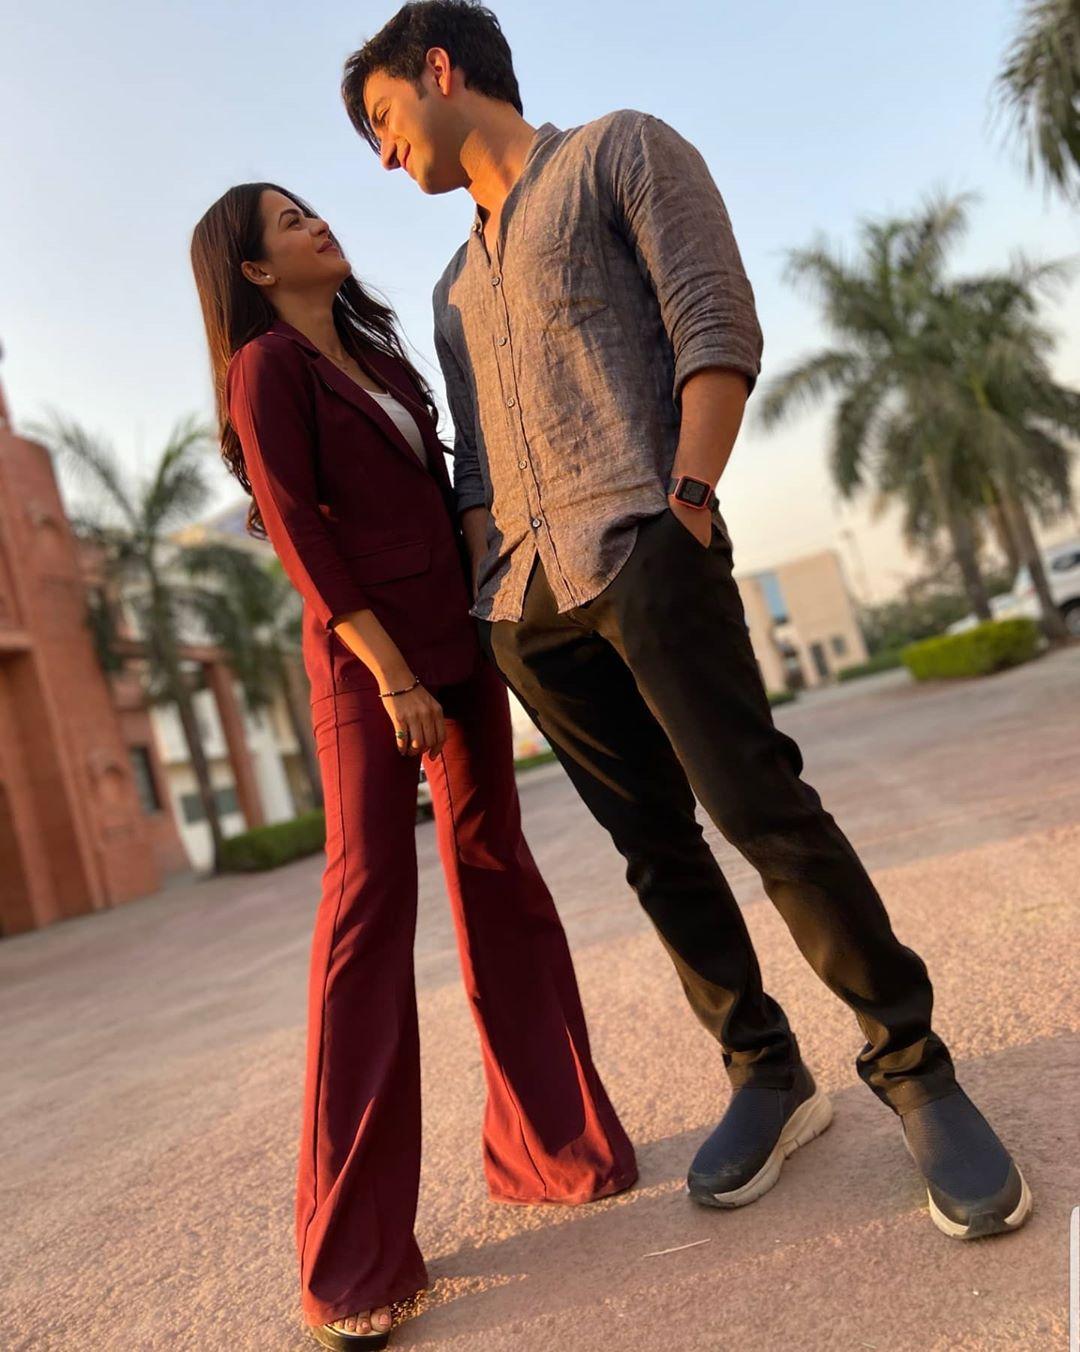 jigyasa-singh-and-avinash-mukherjee-relationship